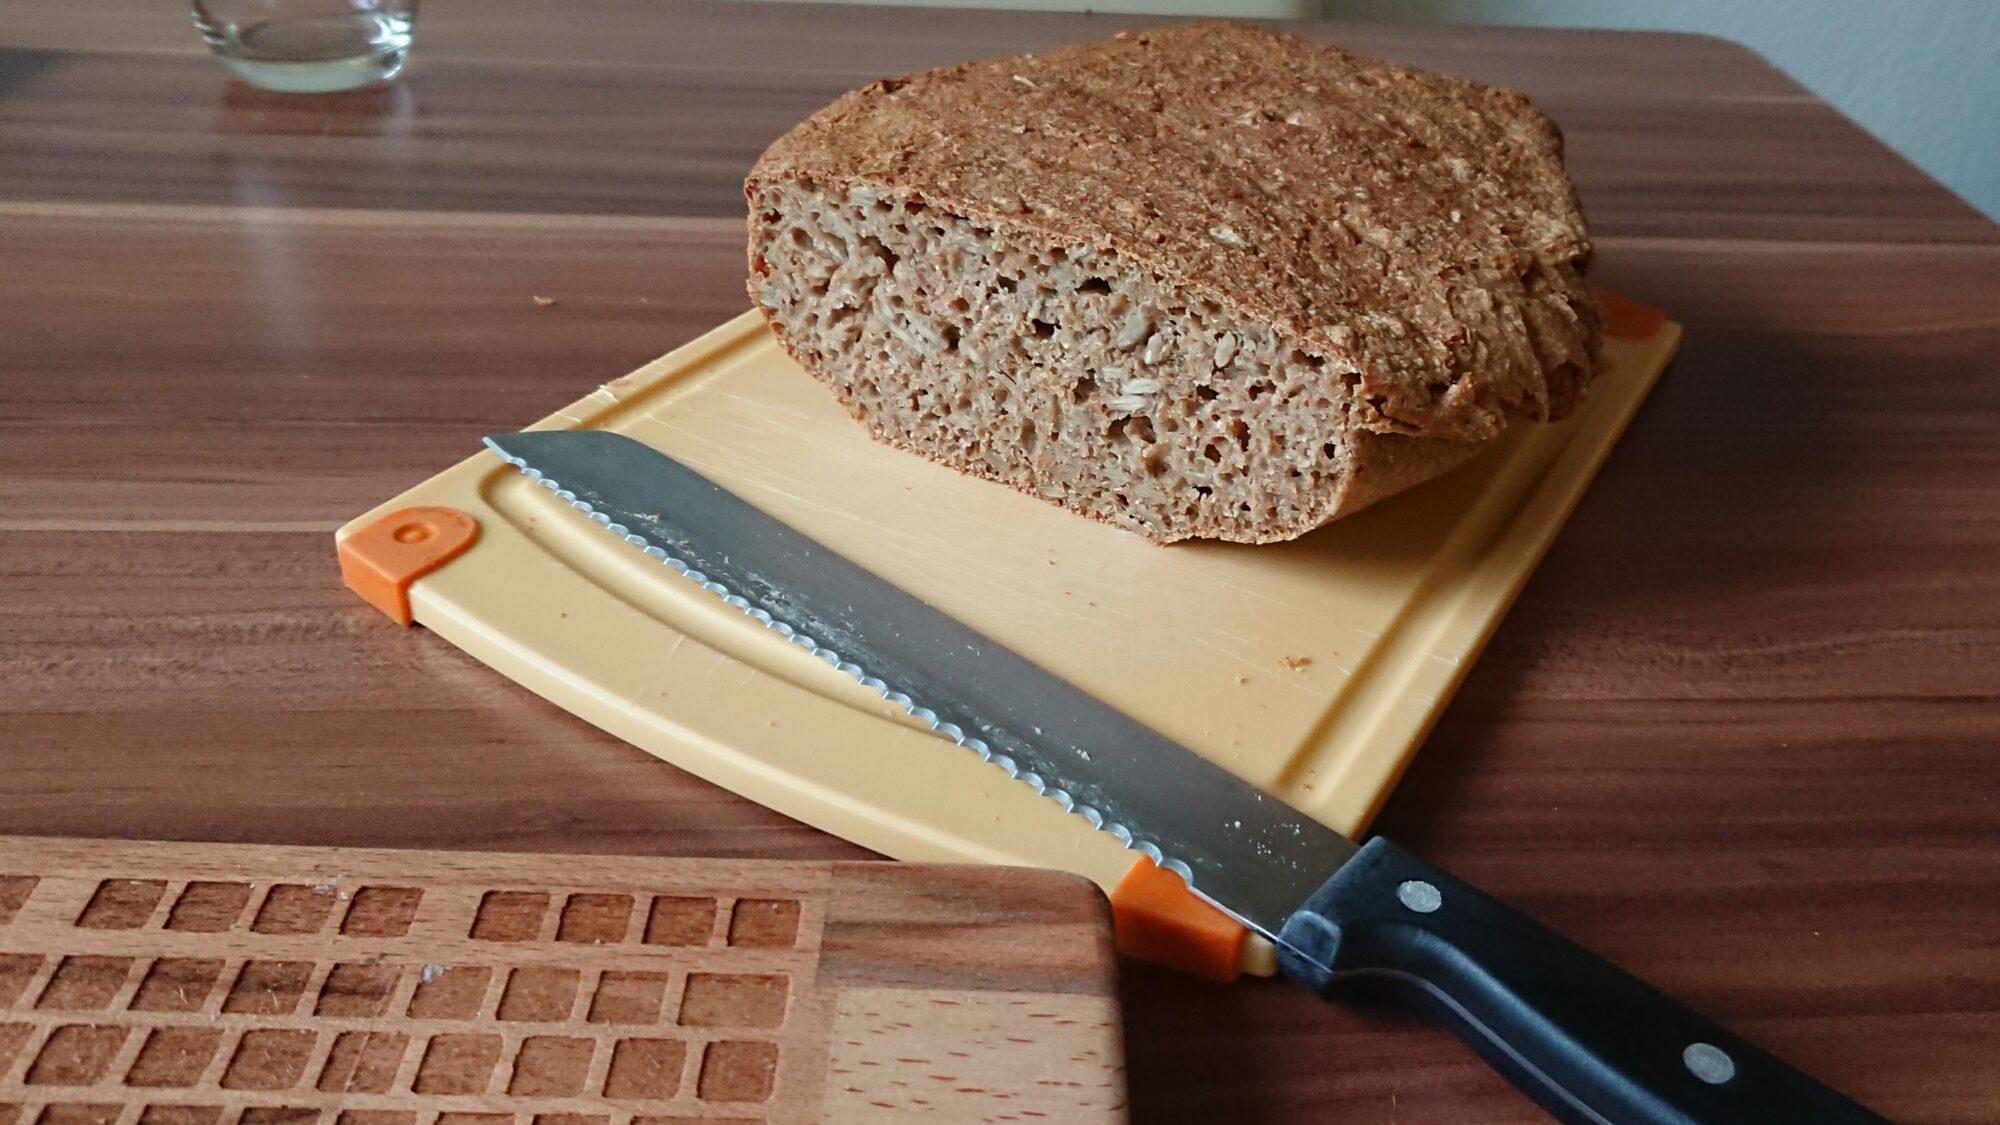 angeschnittener Brotlaib